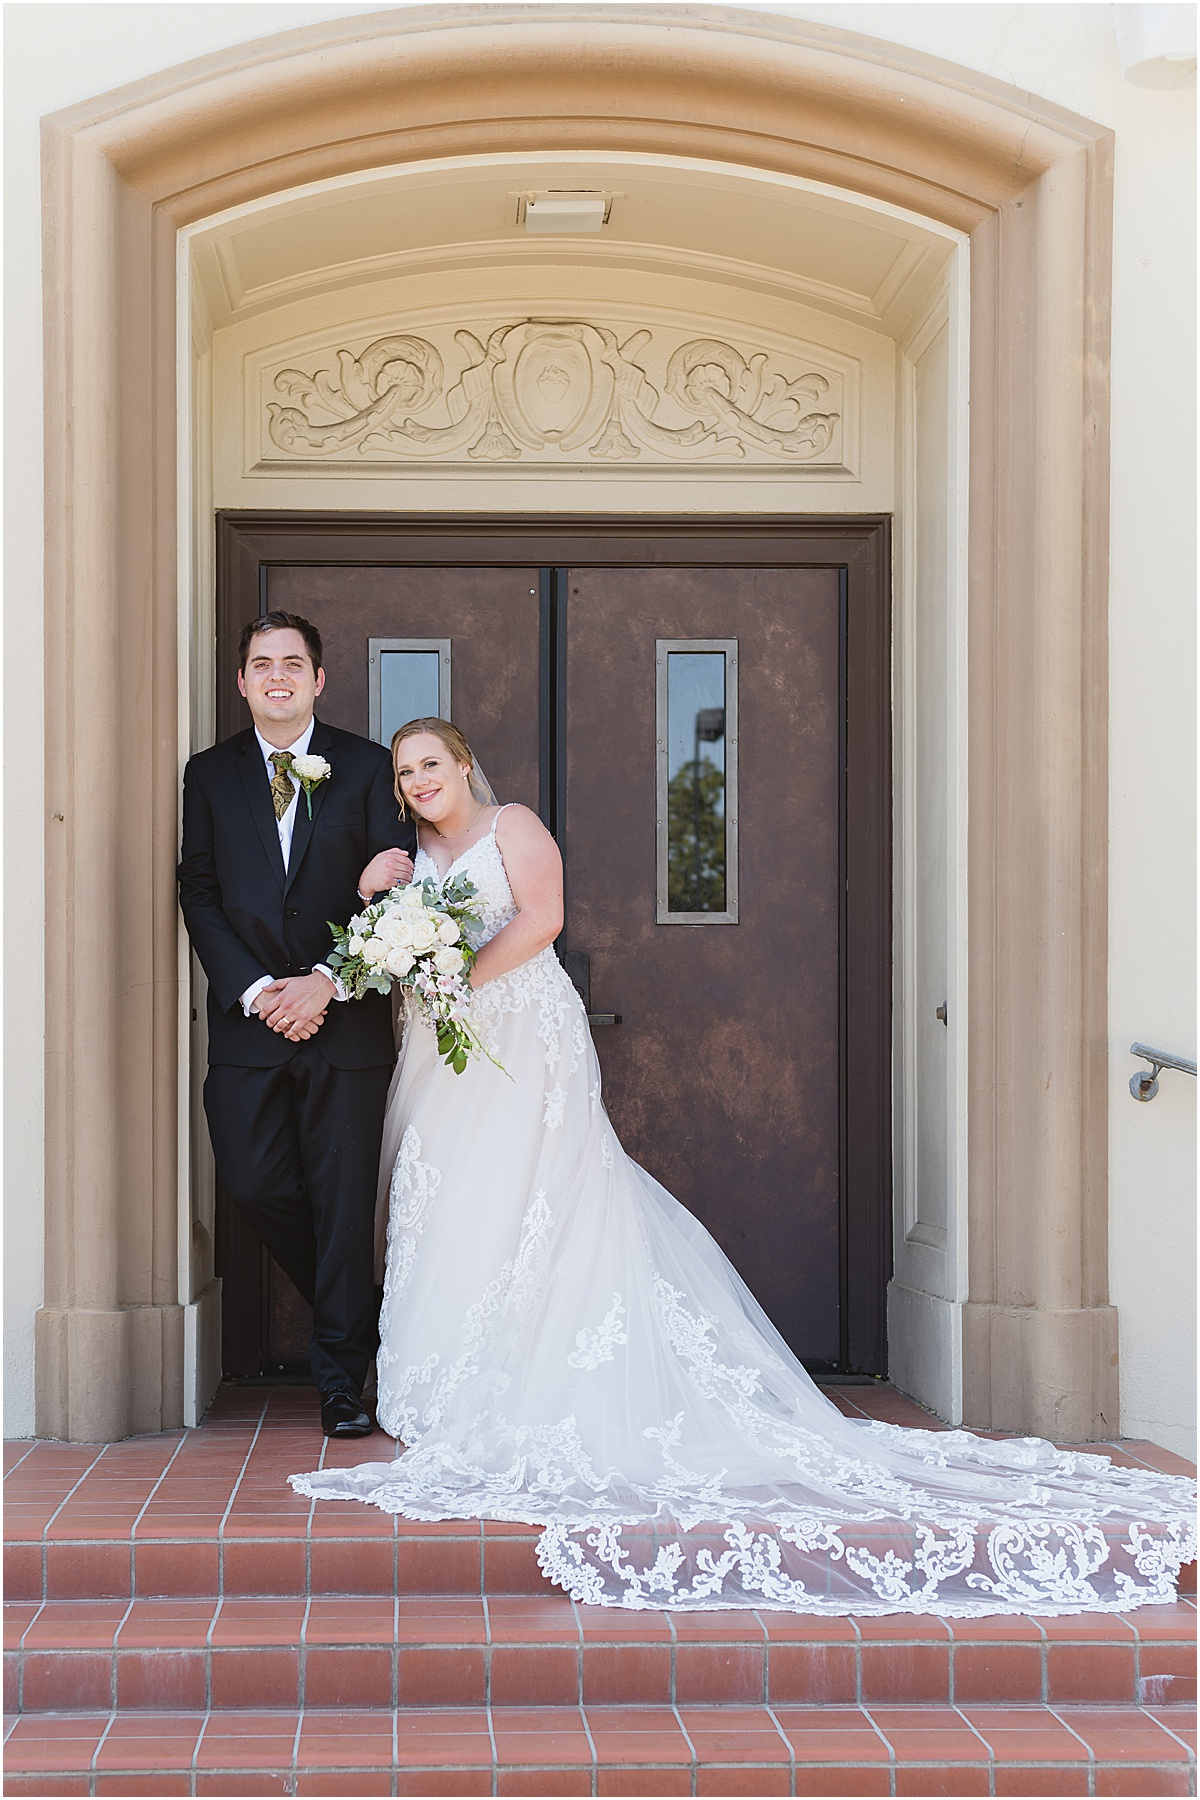 Gilroy wedding at saint mary's catholic church Ashley and Stephen